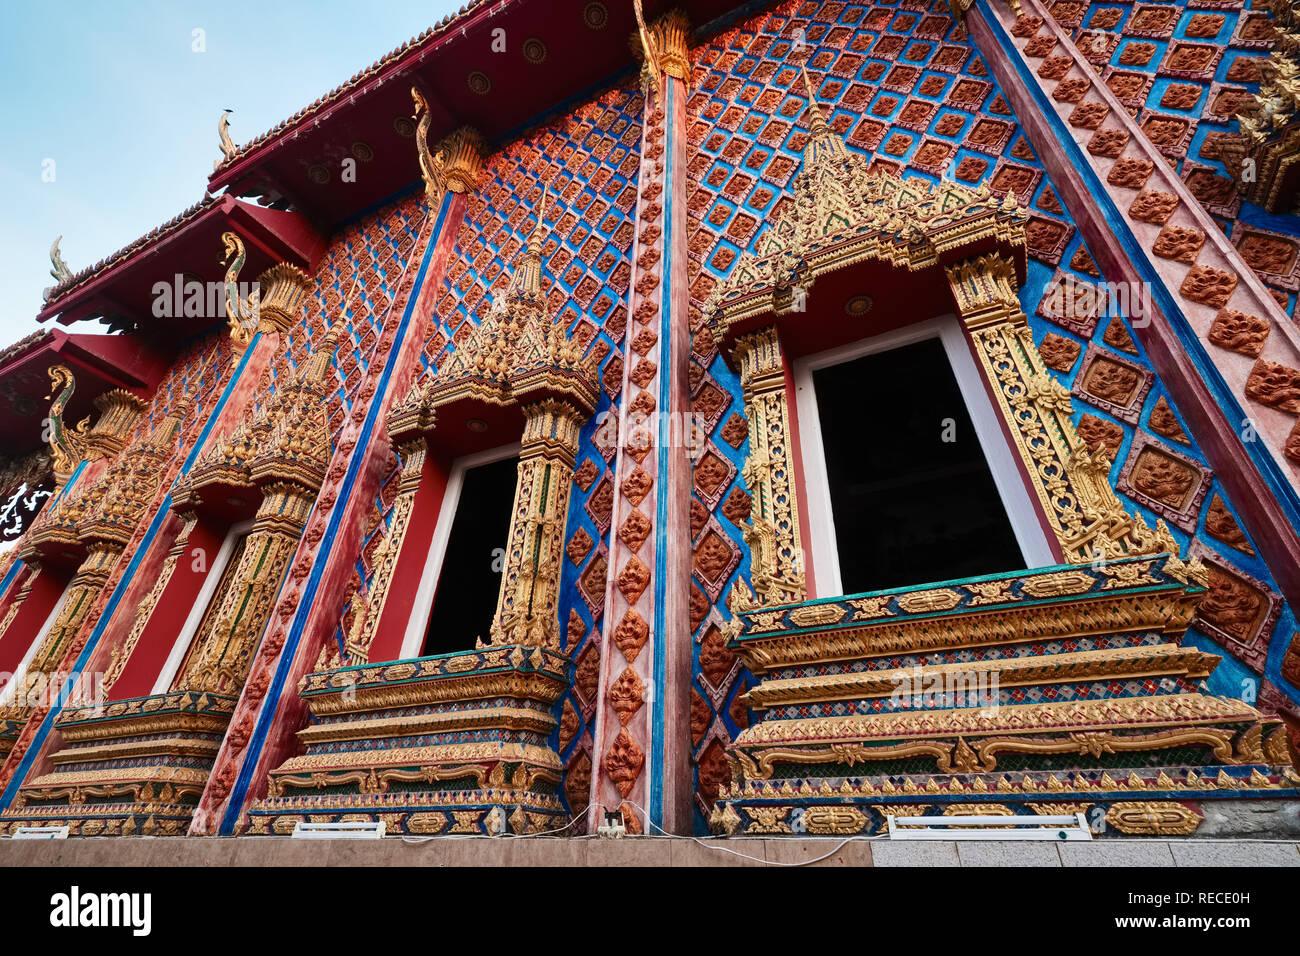 Die kunstvolle Fenster und Wand Ornamentik der Wat Phra Nang San, Thalang, Phuket, Thailand Stockfoto